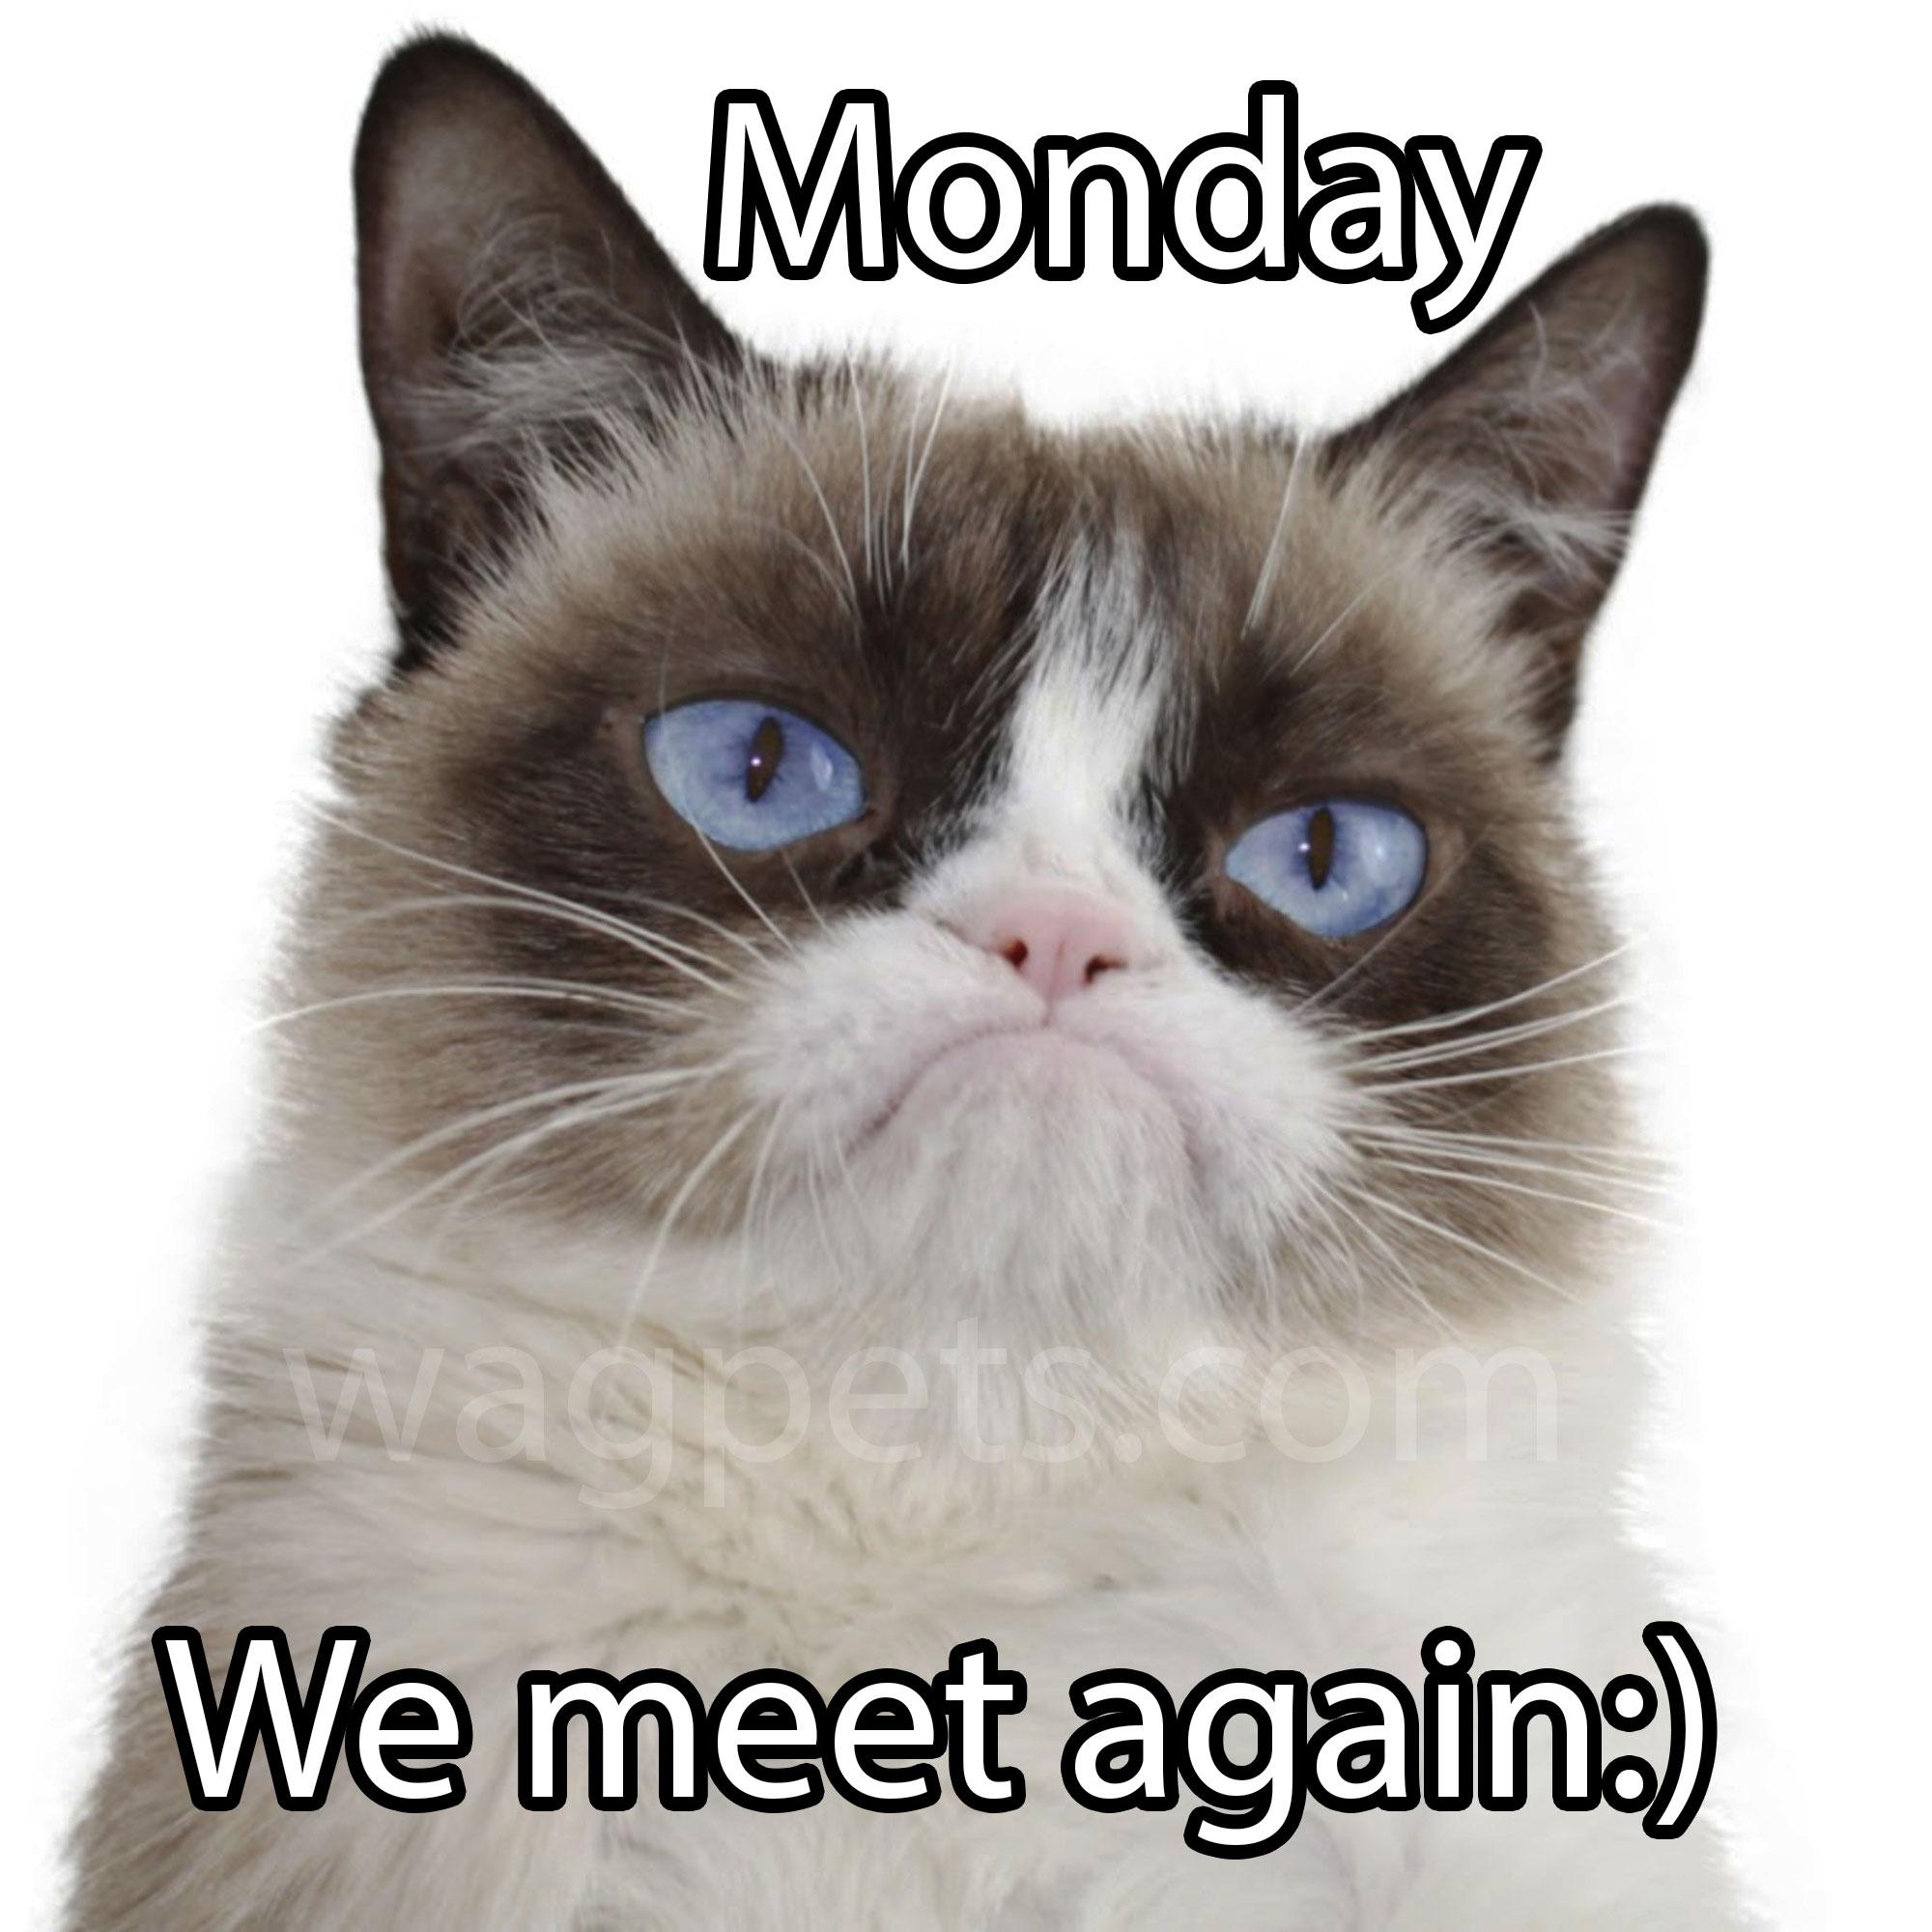 Monday we meet again